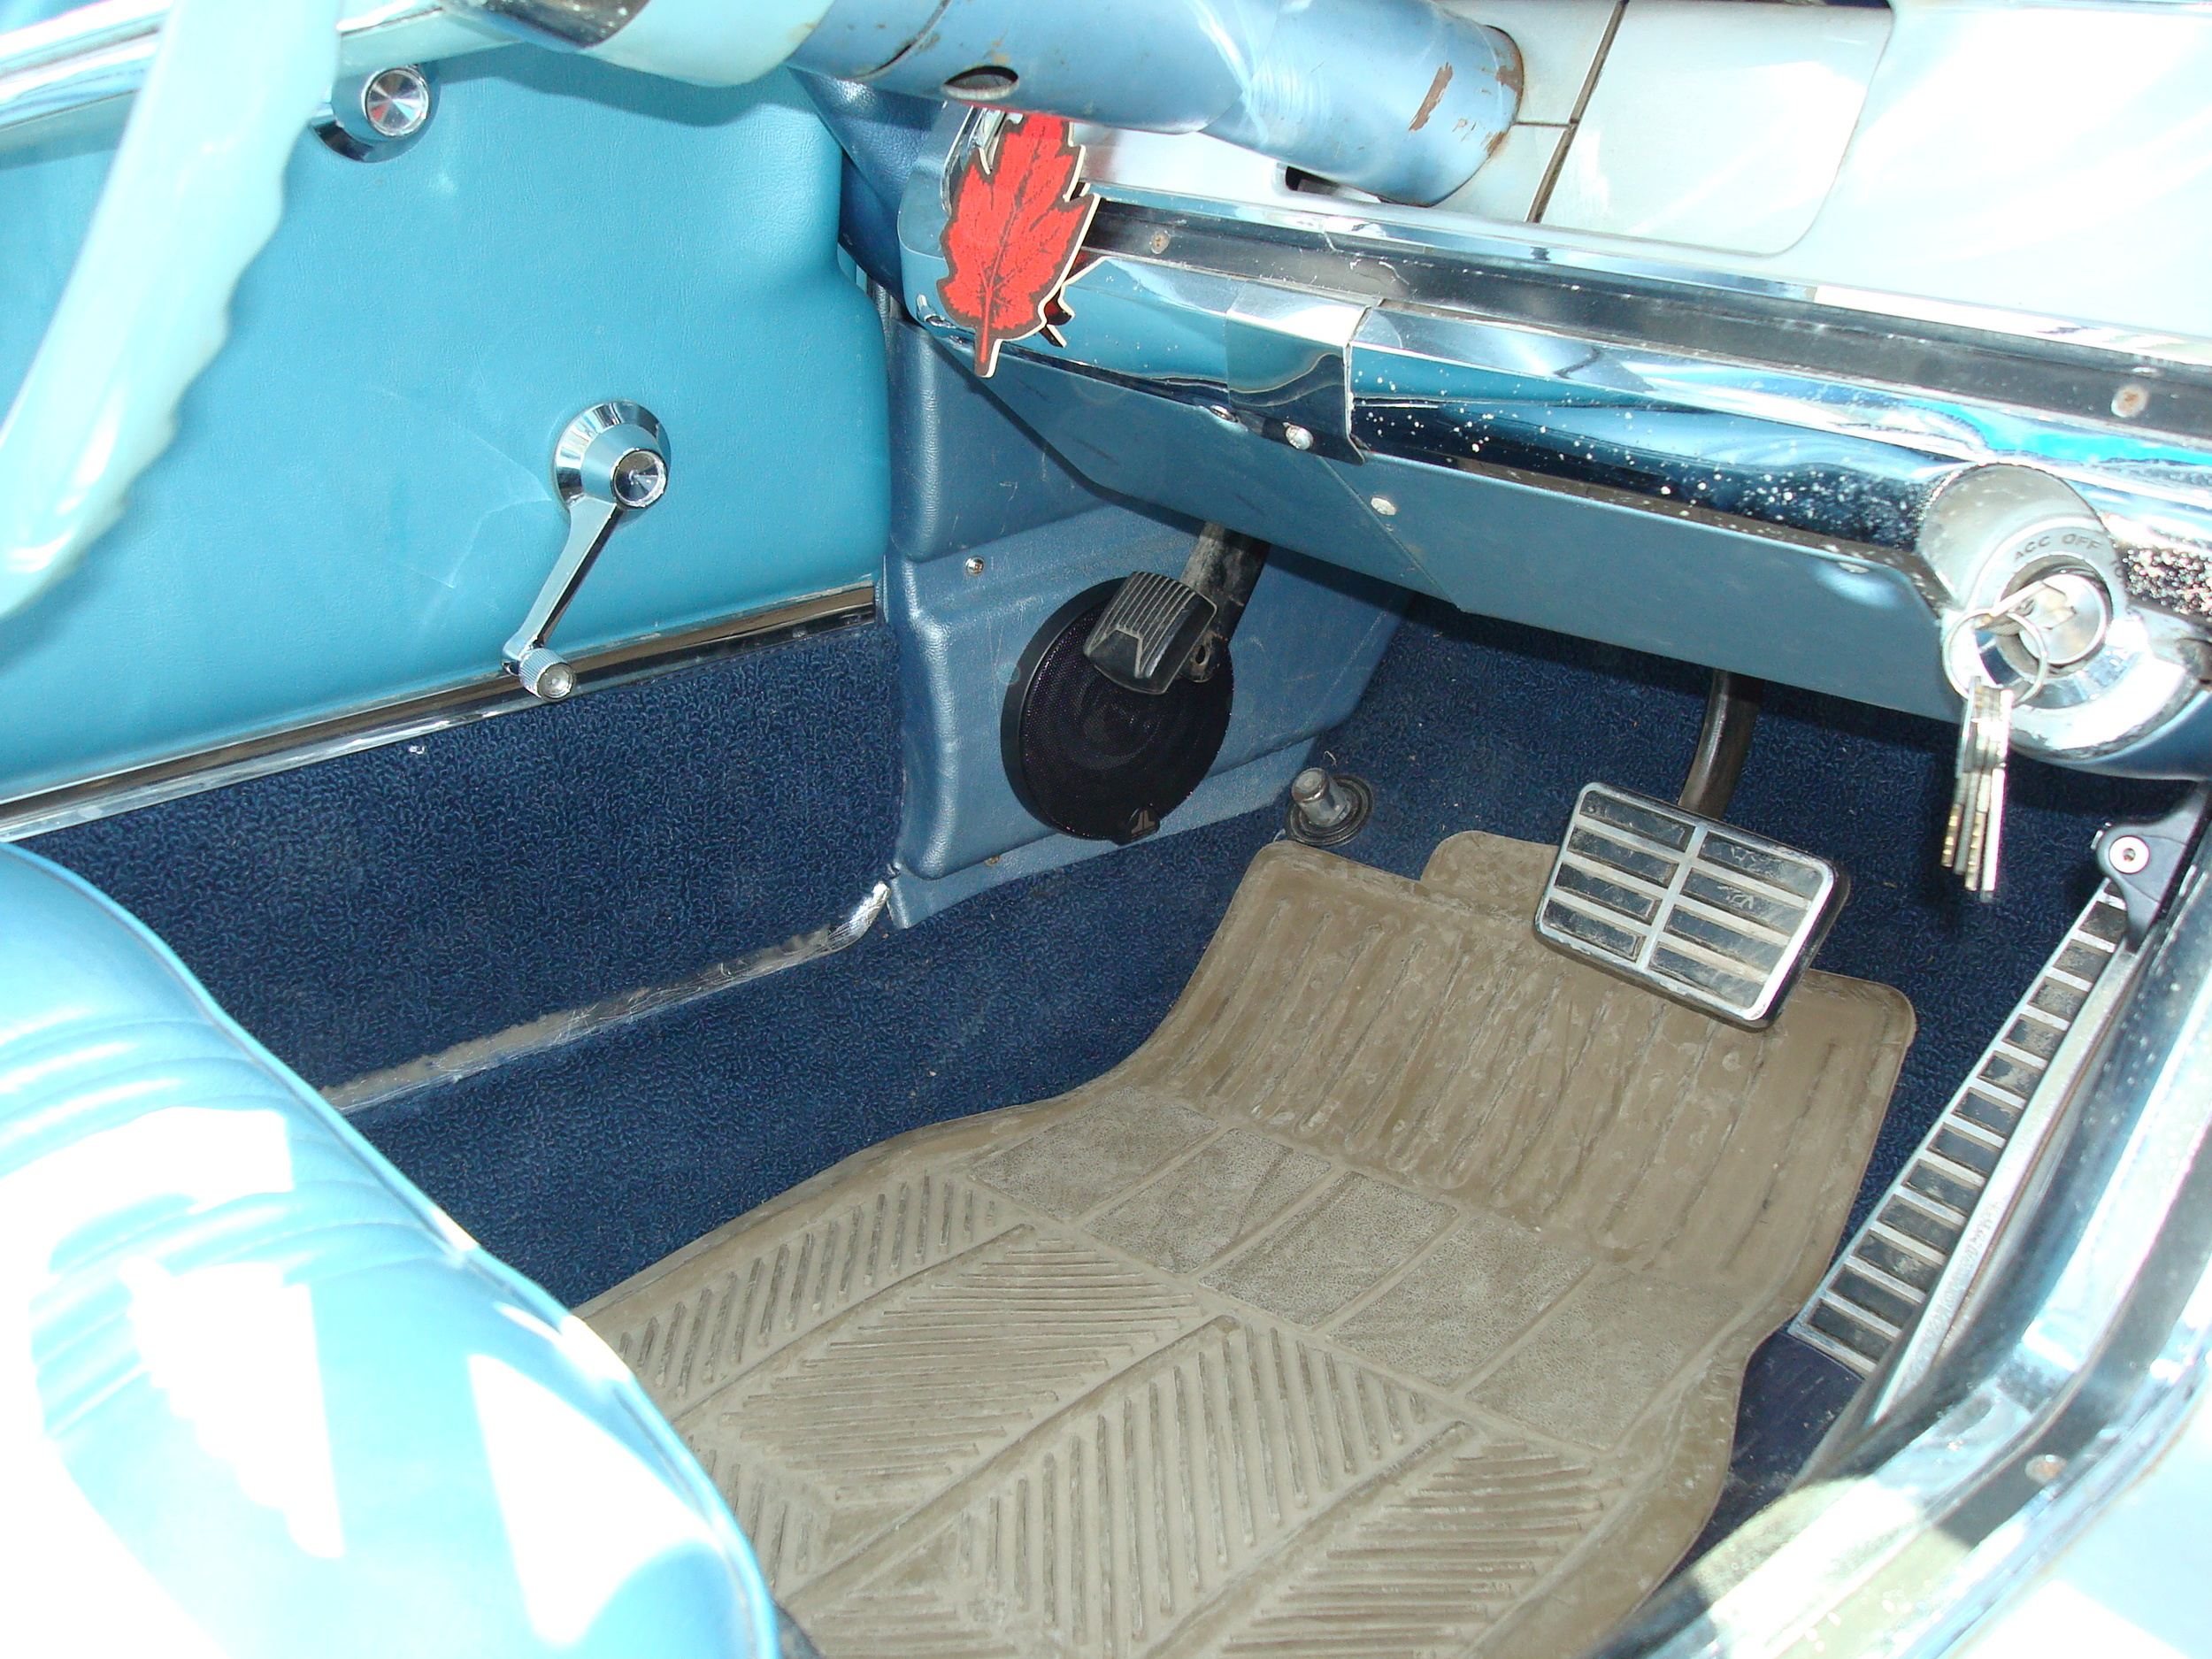 1964 Thunderbird - JL Audio Kick Panel Speakers